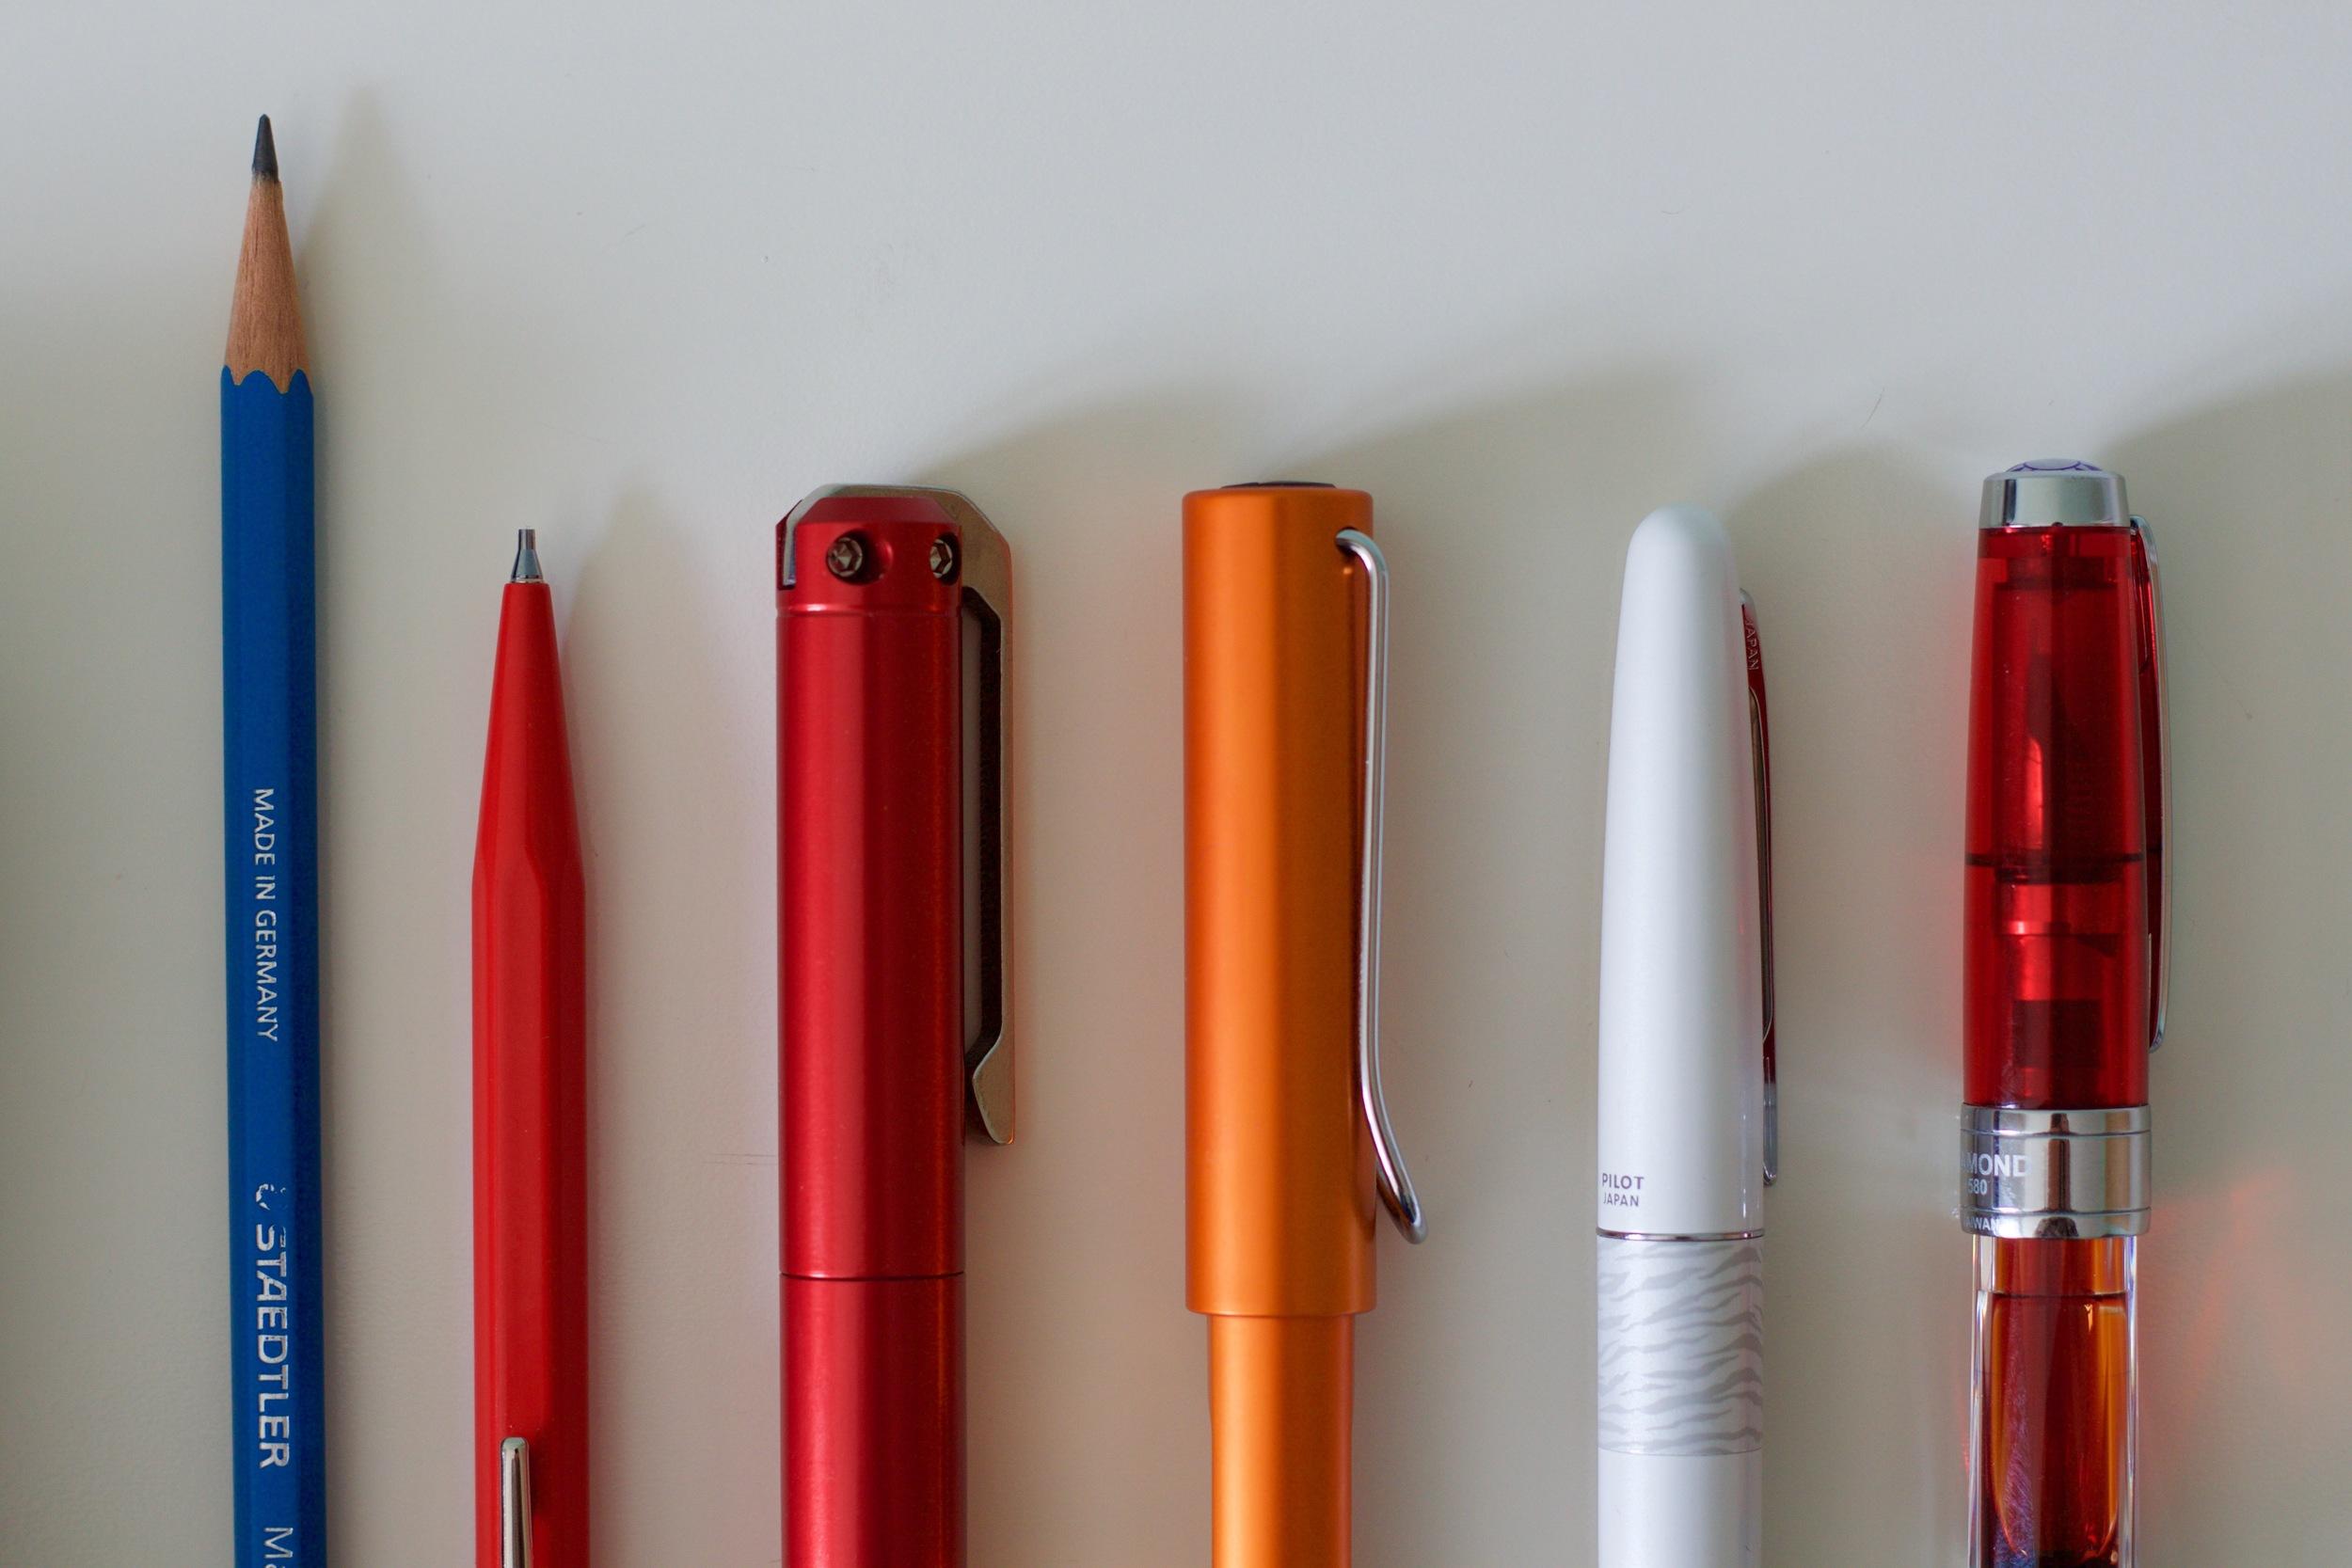 Staedtler Mars Lumograph, Caran d'Ache Mechanical Pencil, Karas Kustoms Ink, Lamy AL Star, Pilot Metropolitan, TWSBI 580 RB